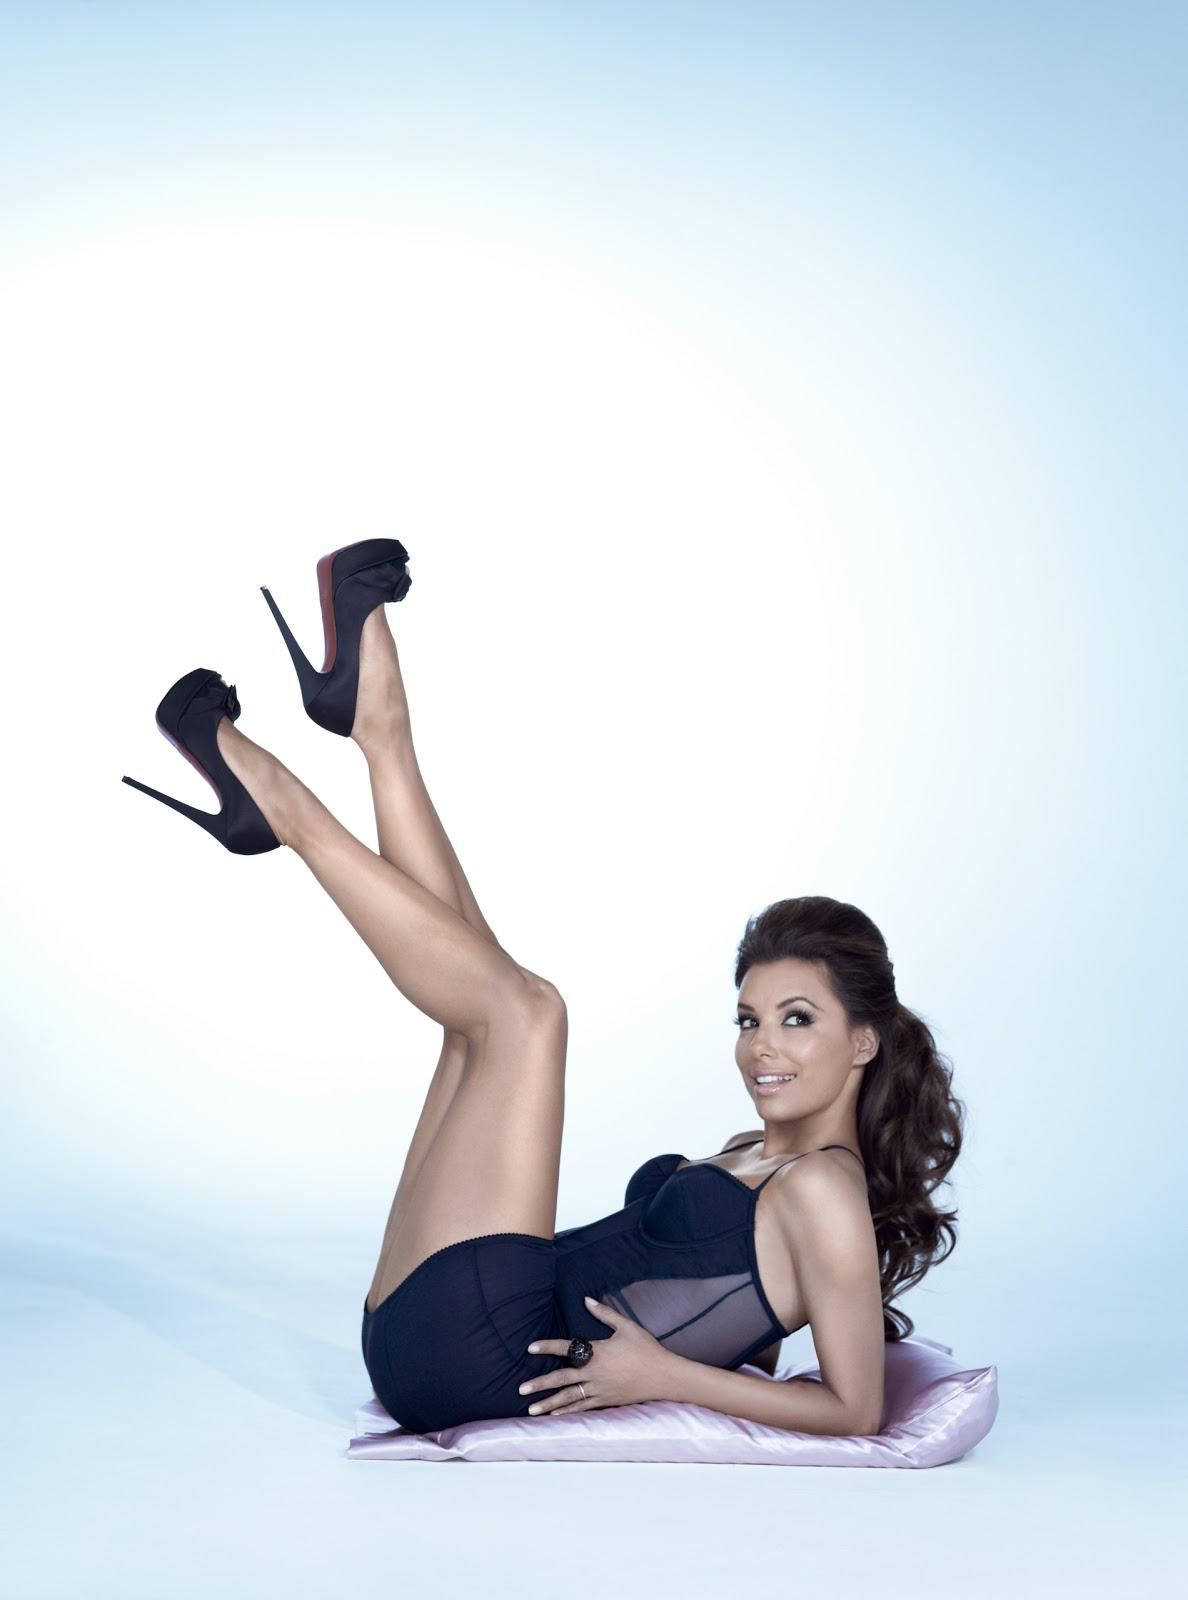 Eva longoria photo shoot opinion you